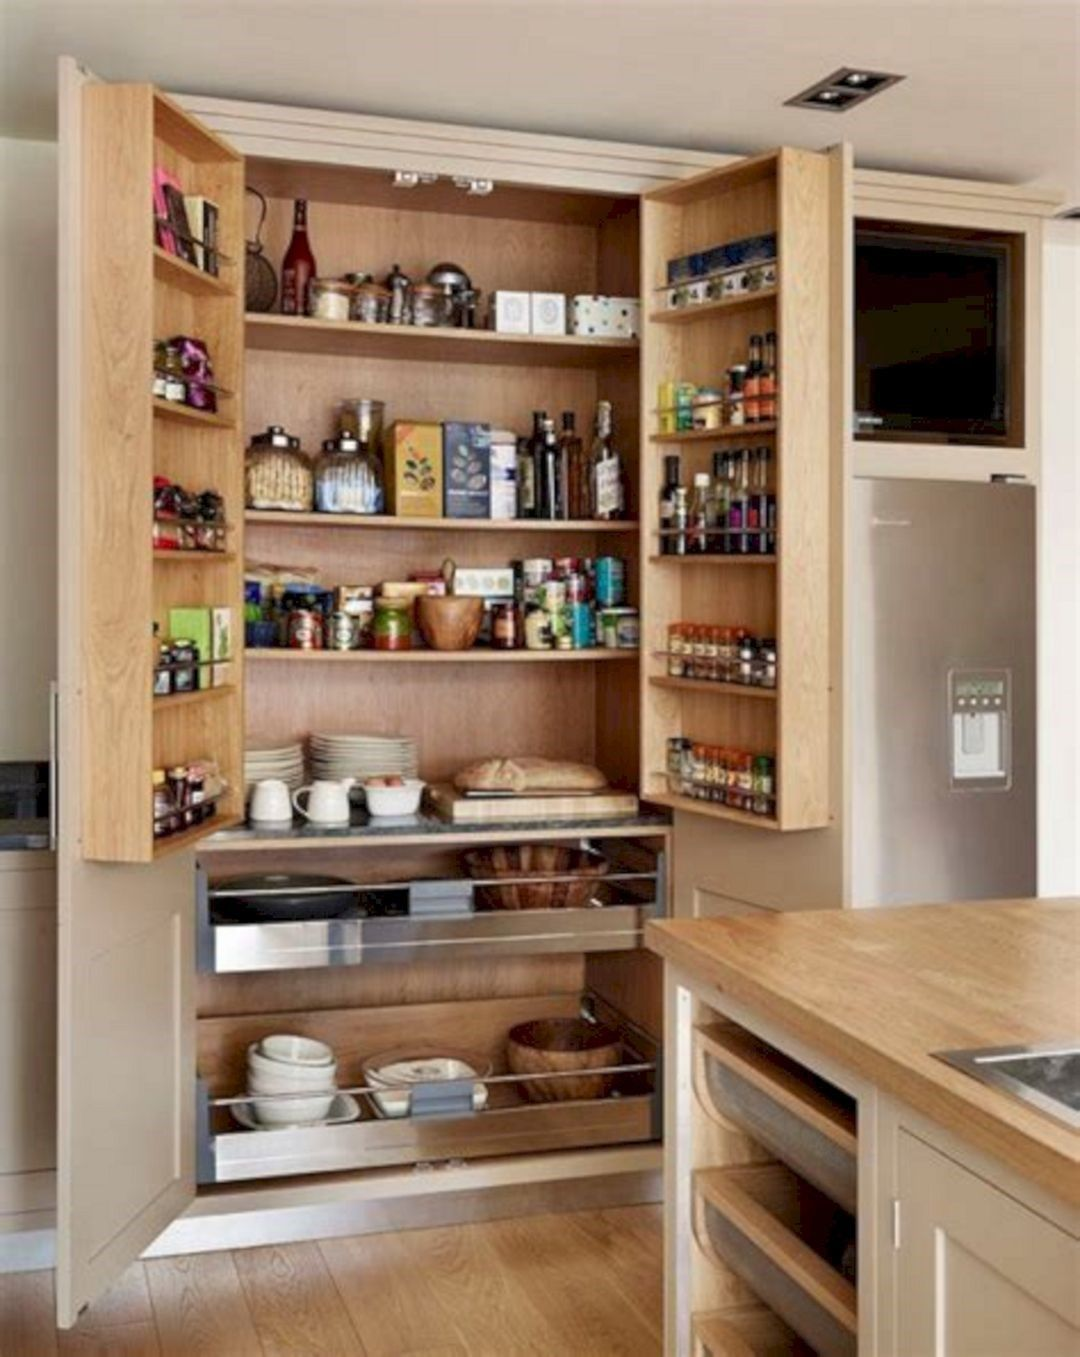 25 Creative Kitchen Pantry Ideas Kitchen Pantry Design Pantry Design Kitchen Design